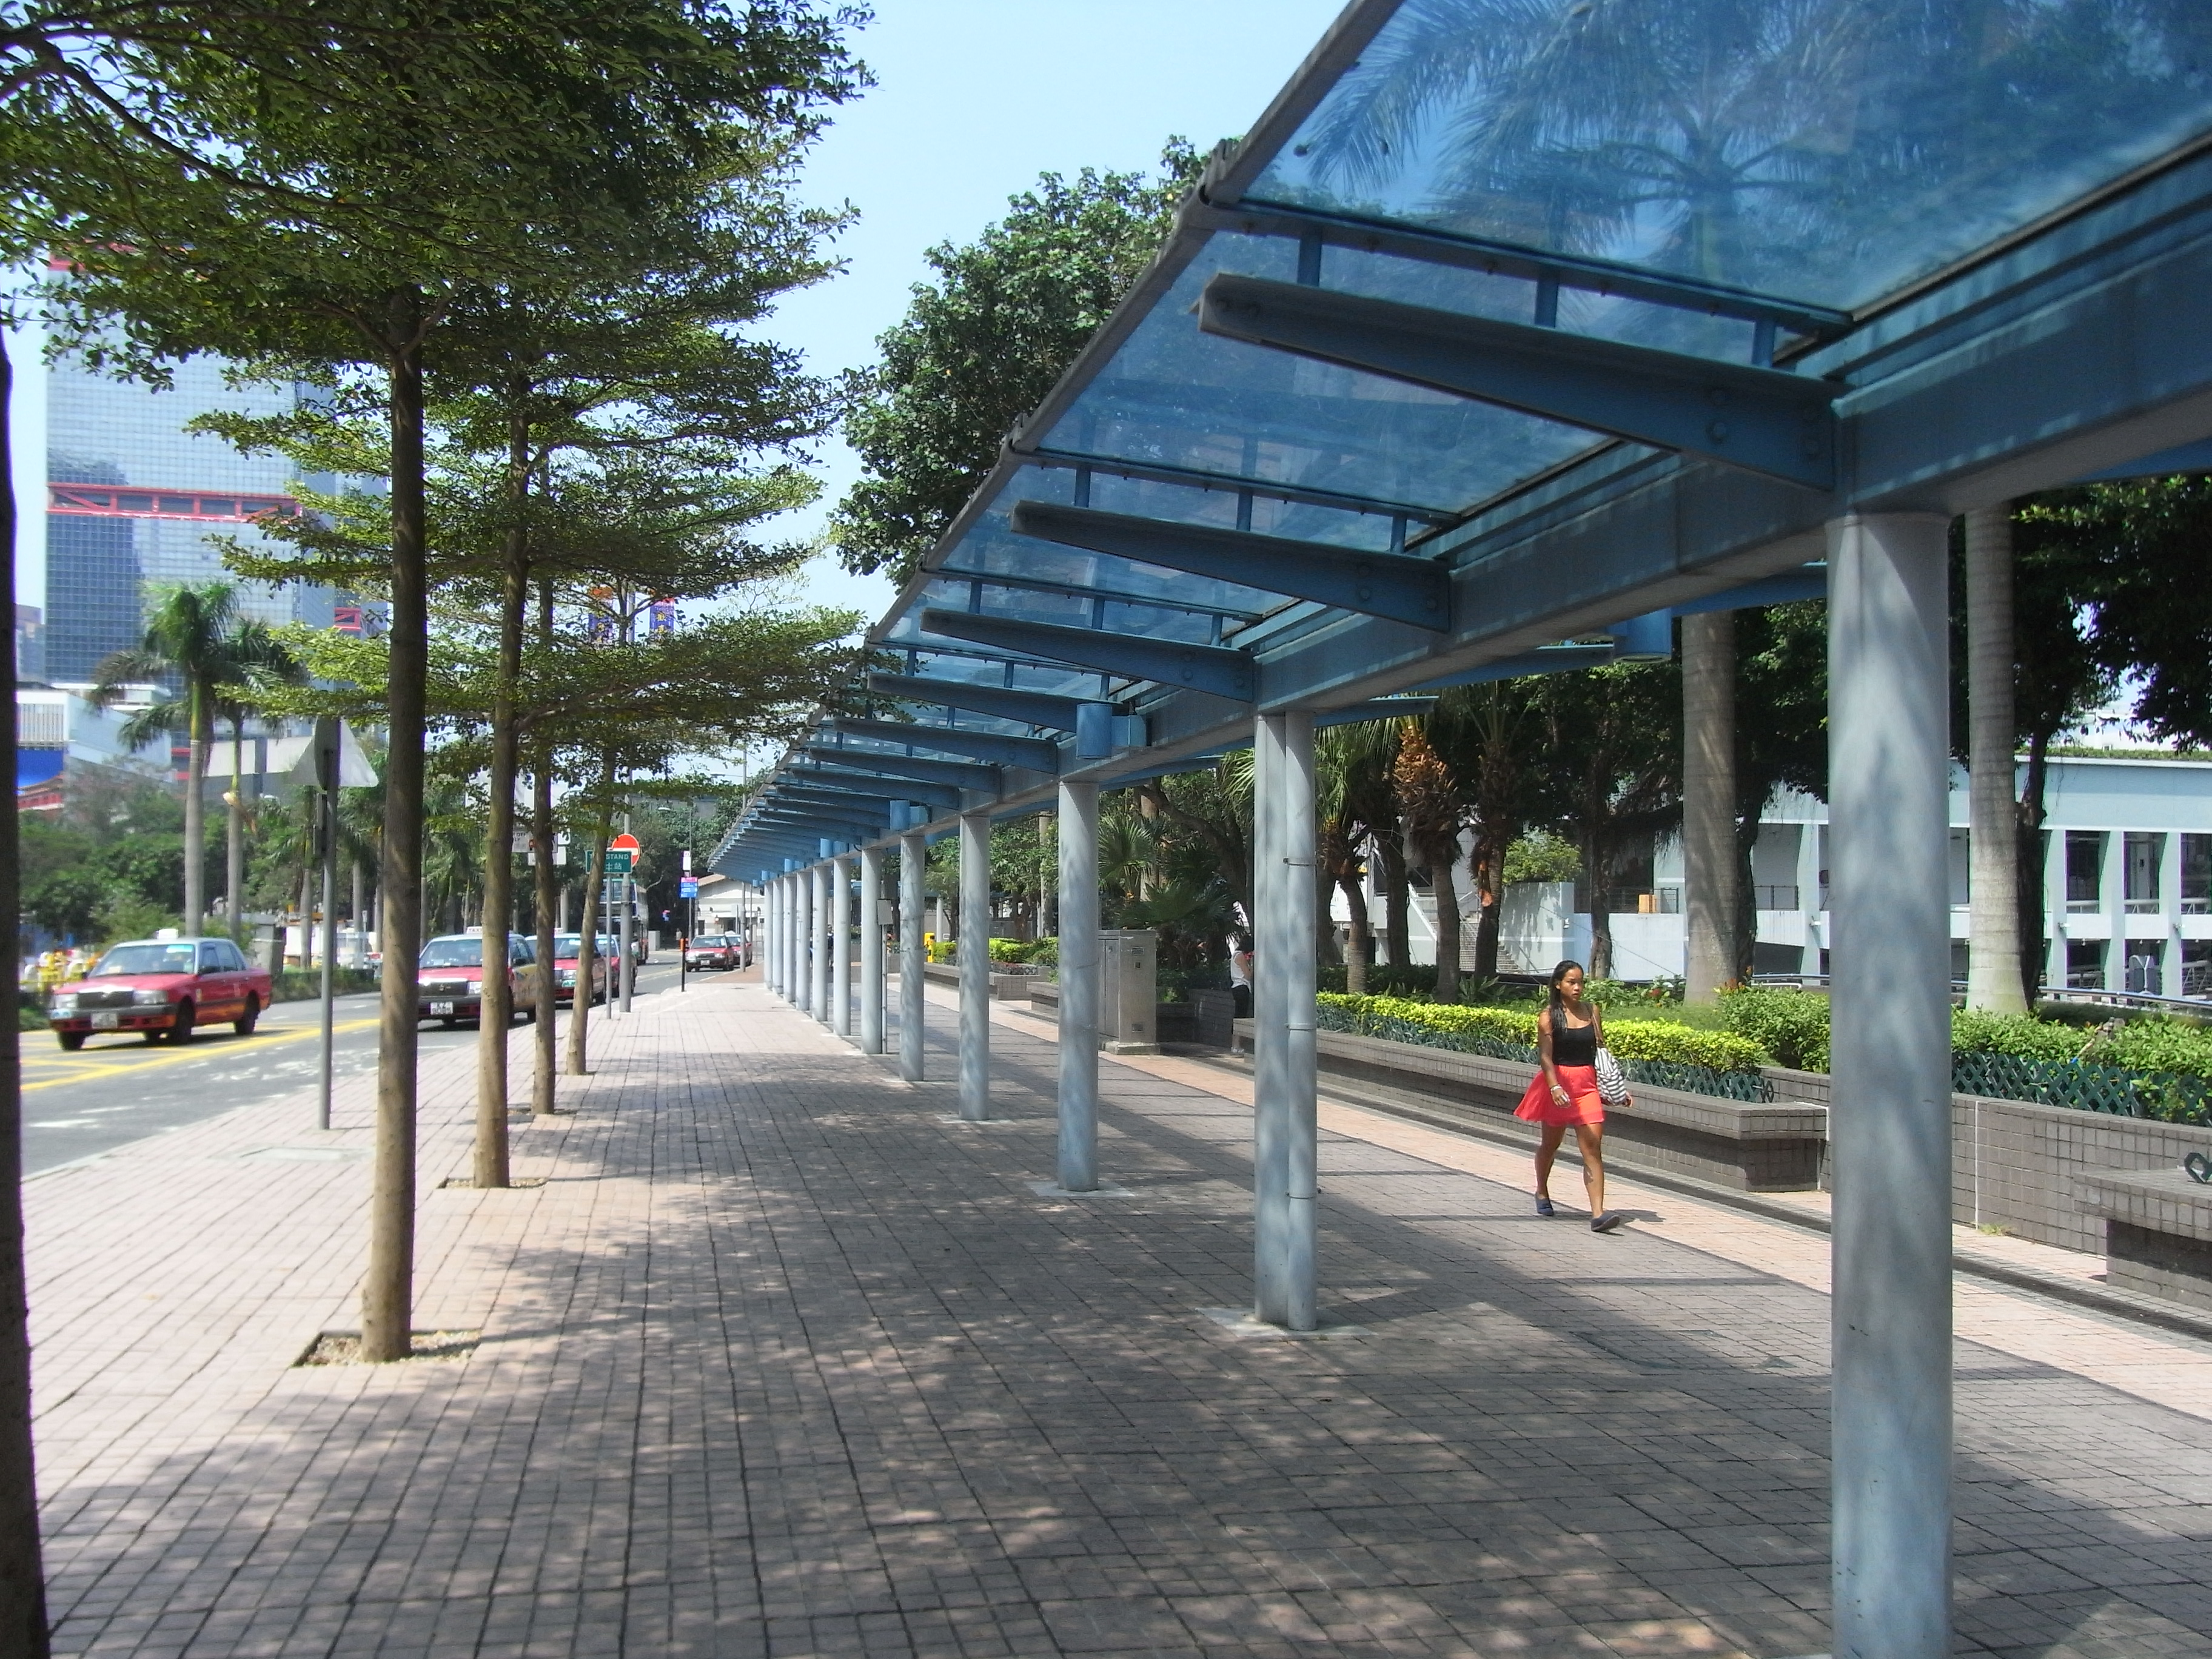 Image result for pedestrian walkway